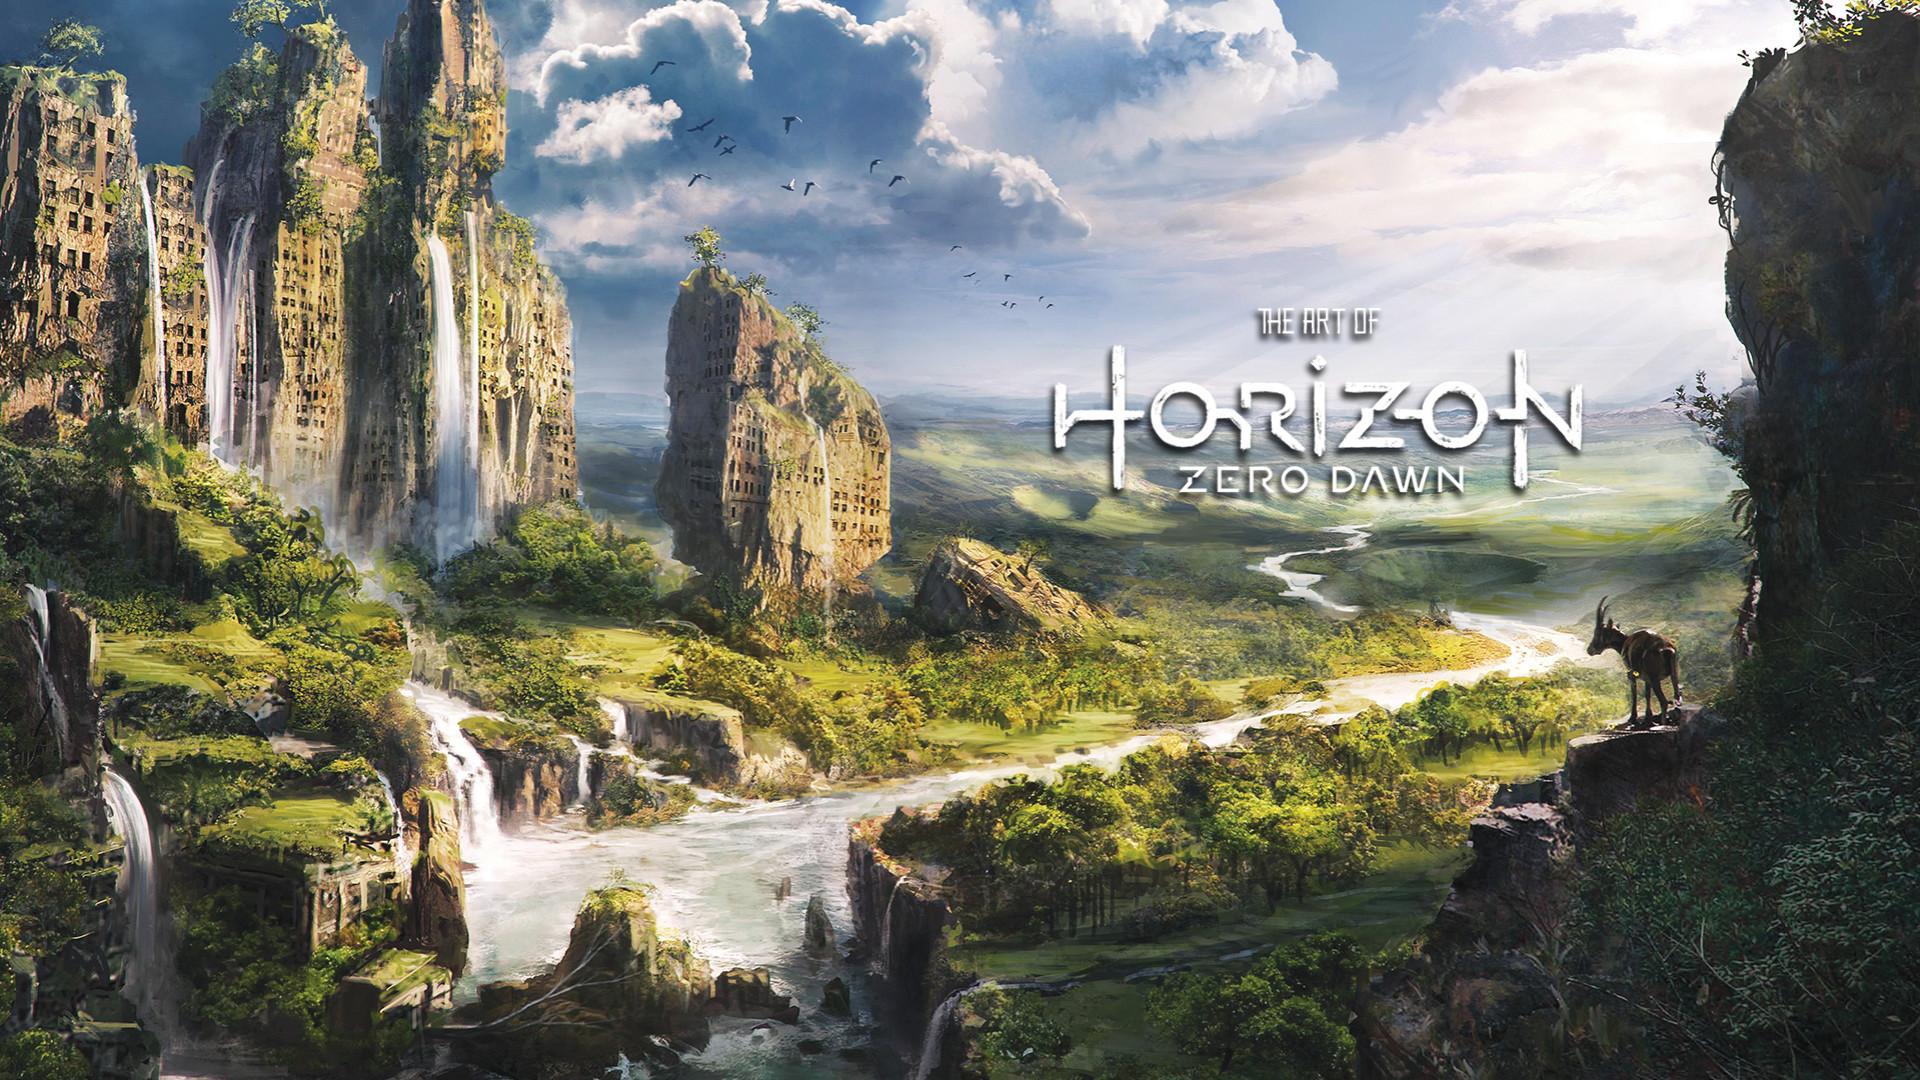 Horizon Zero Dawn Wallpapers (84+ Images